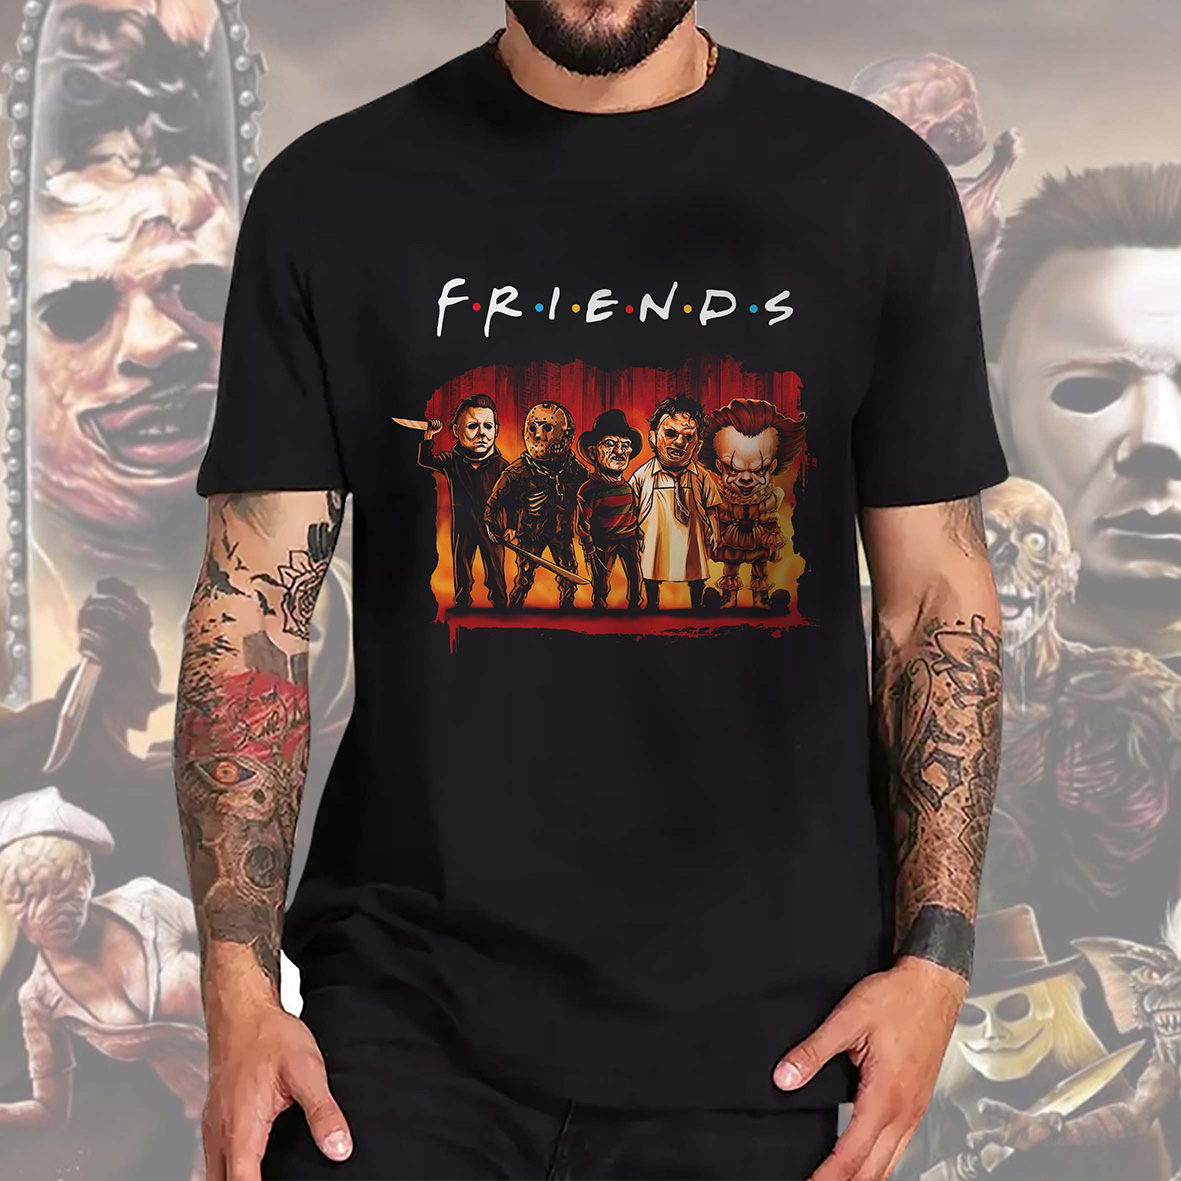 Camiseta Masculina Unissex Friends Halloween Horror Serial Killers Terror Personagens (Preta) - EV